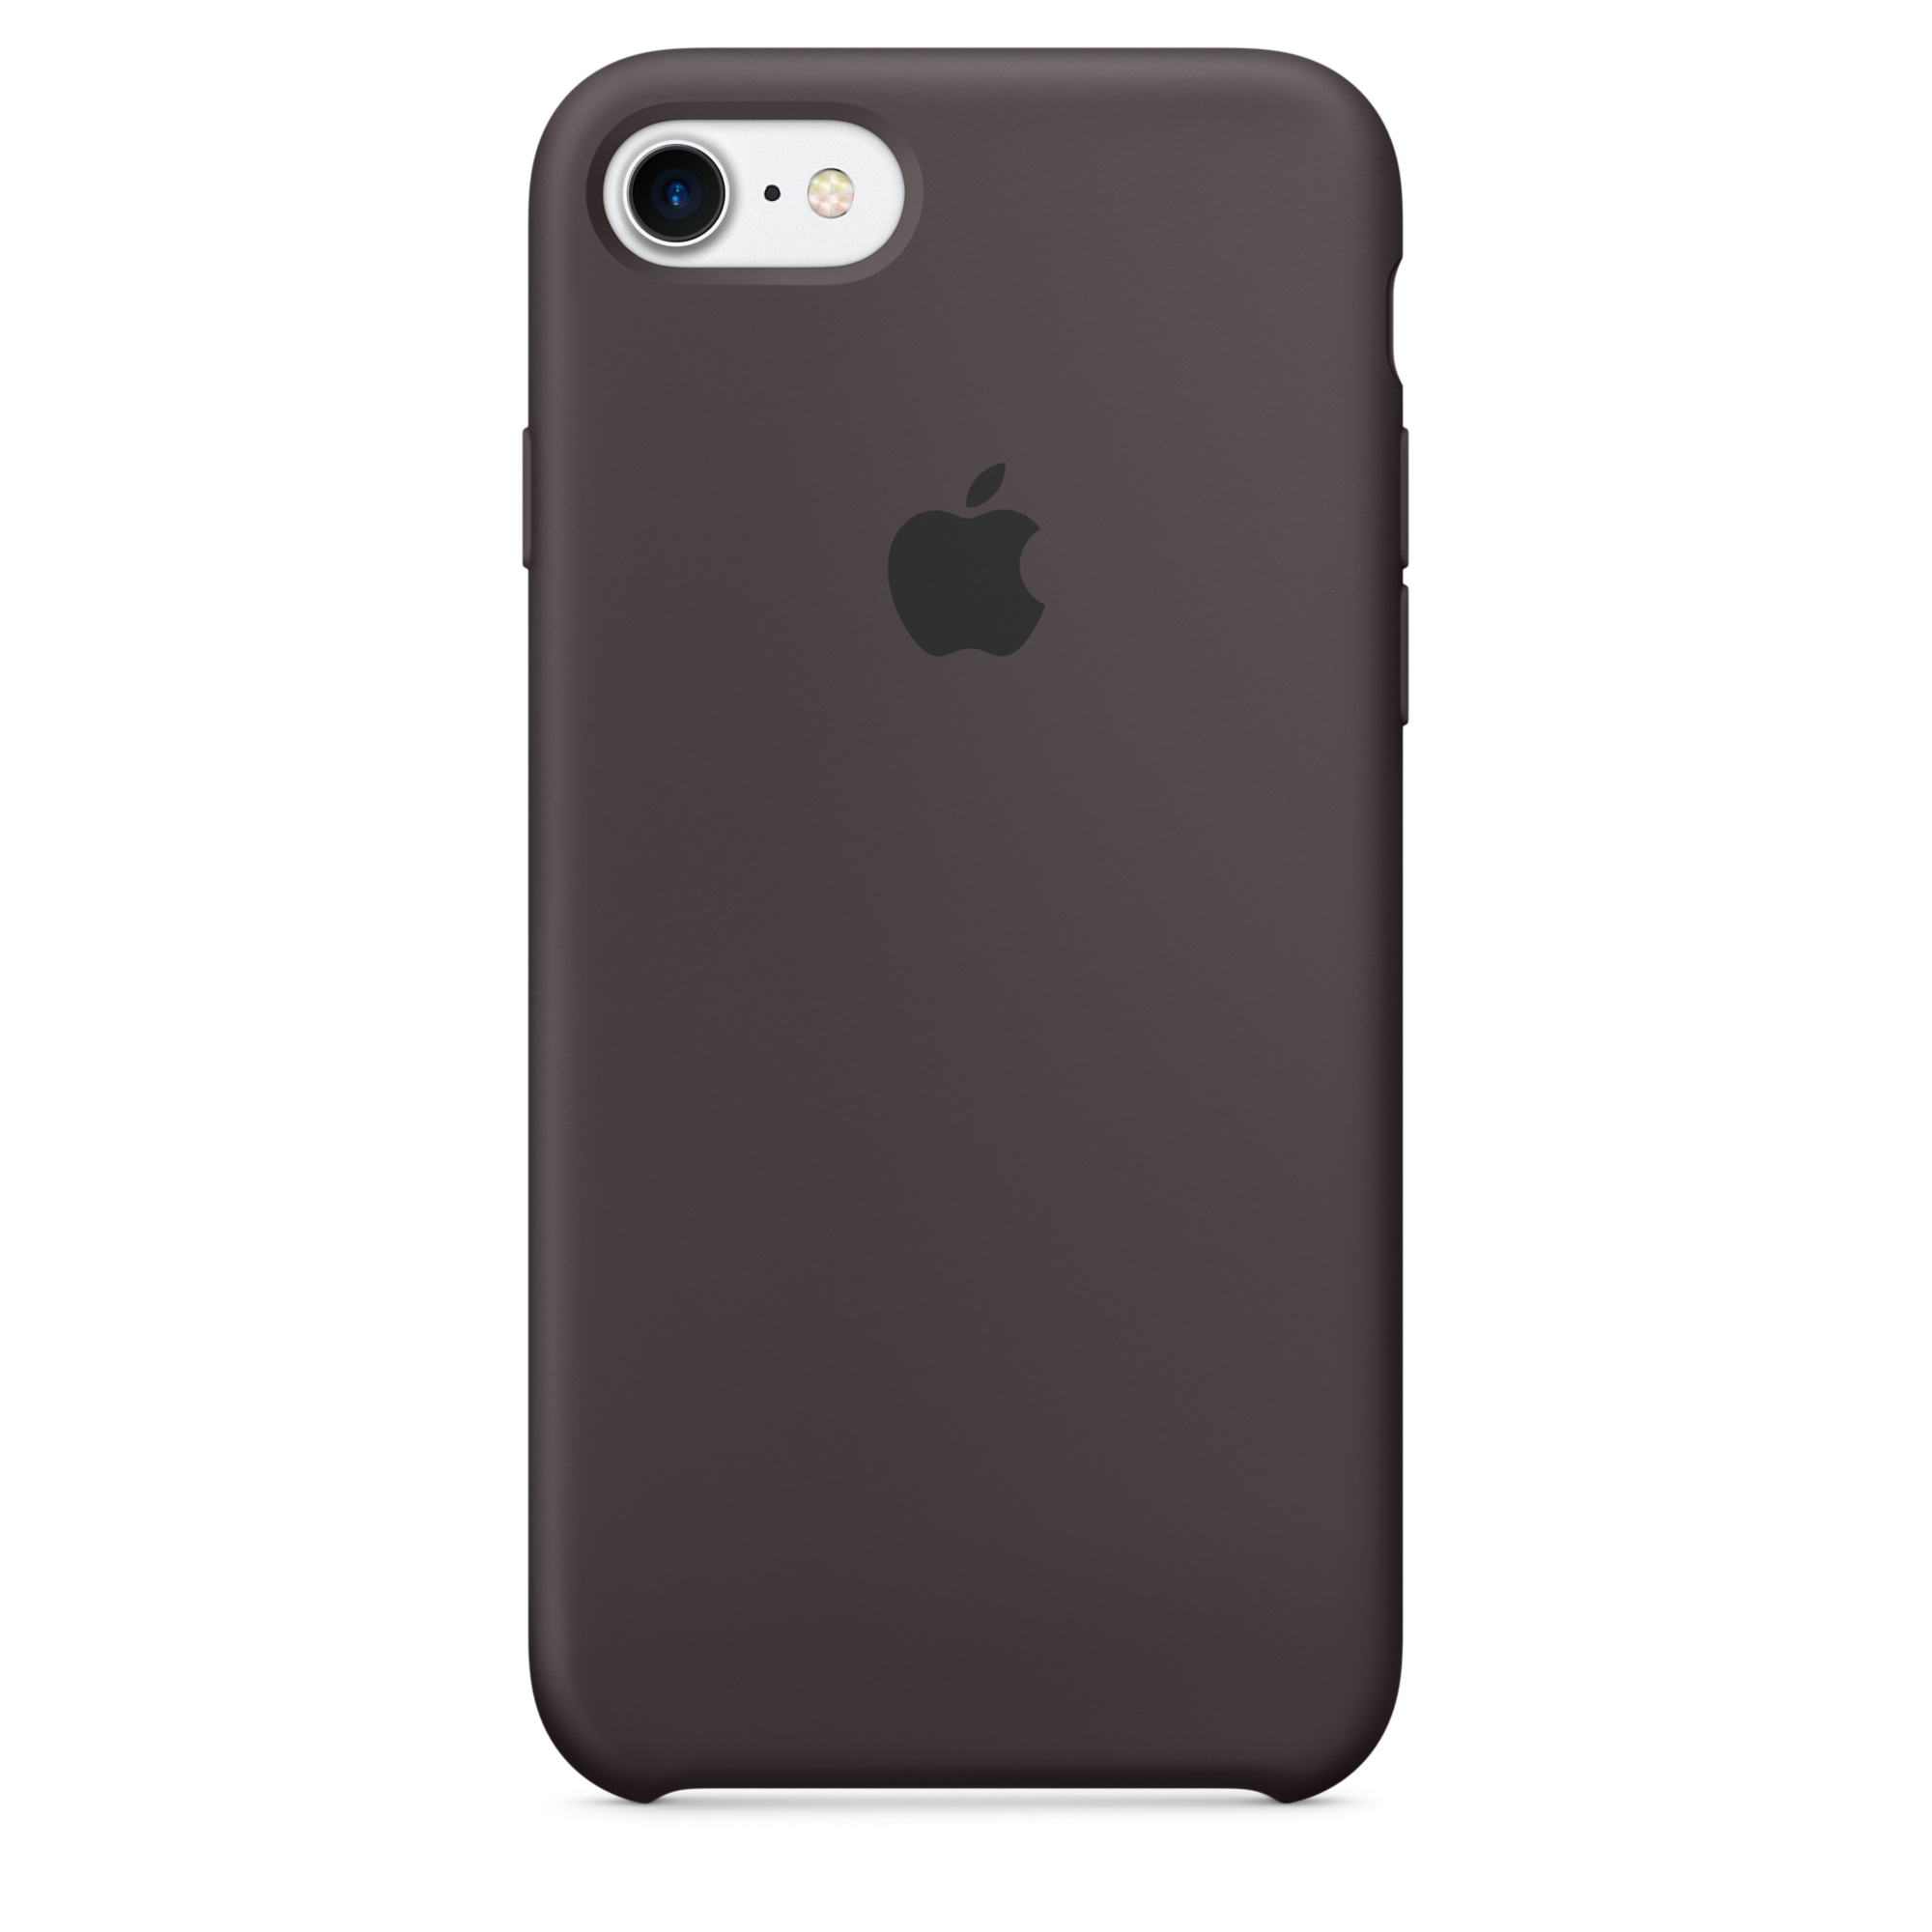 Pouzdro / kryt pro Apple iPhone 7 - Apple, Silicone Case Cocoa